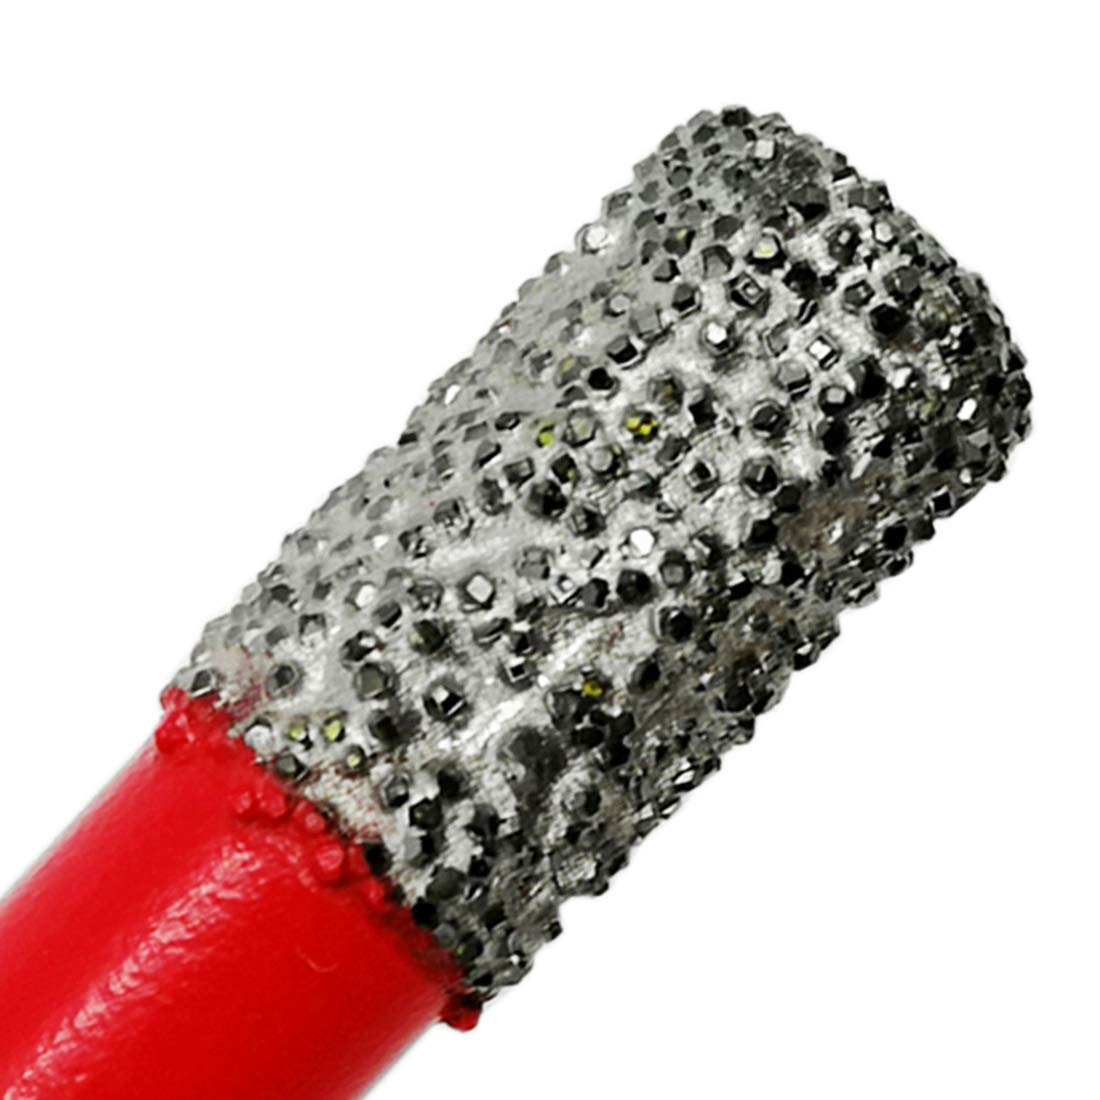 SHDIATOOL Dry Diamond Drill Core Bit Diameter 16mm Vacuum Brazed Drilling Porcelain Tile Granite Marble